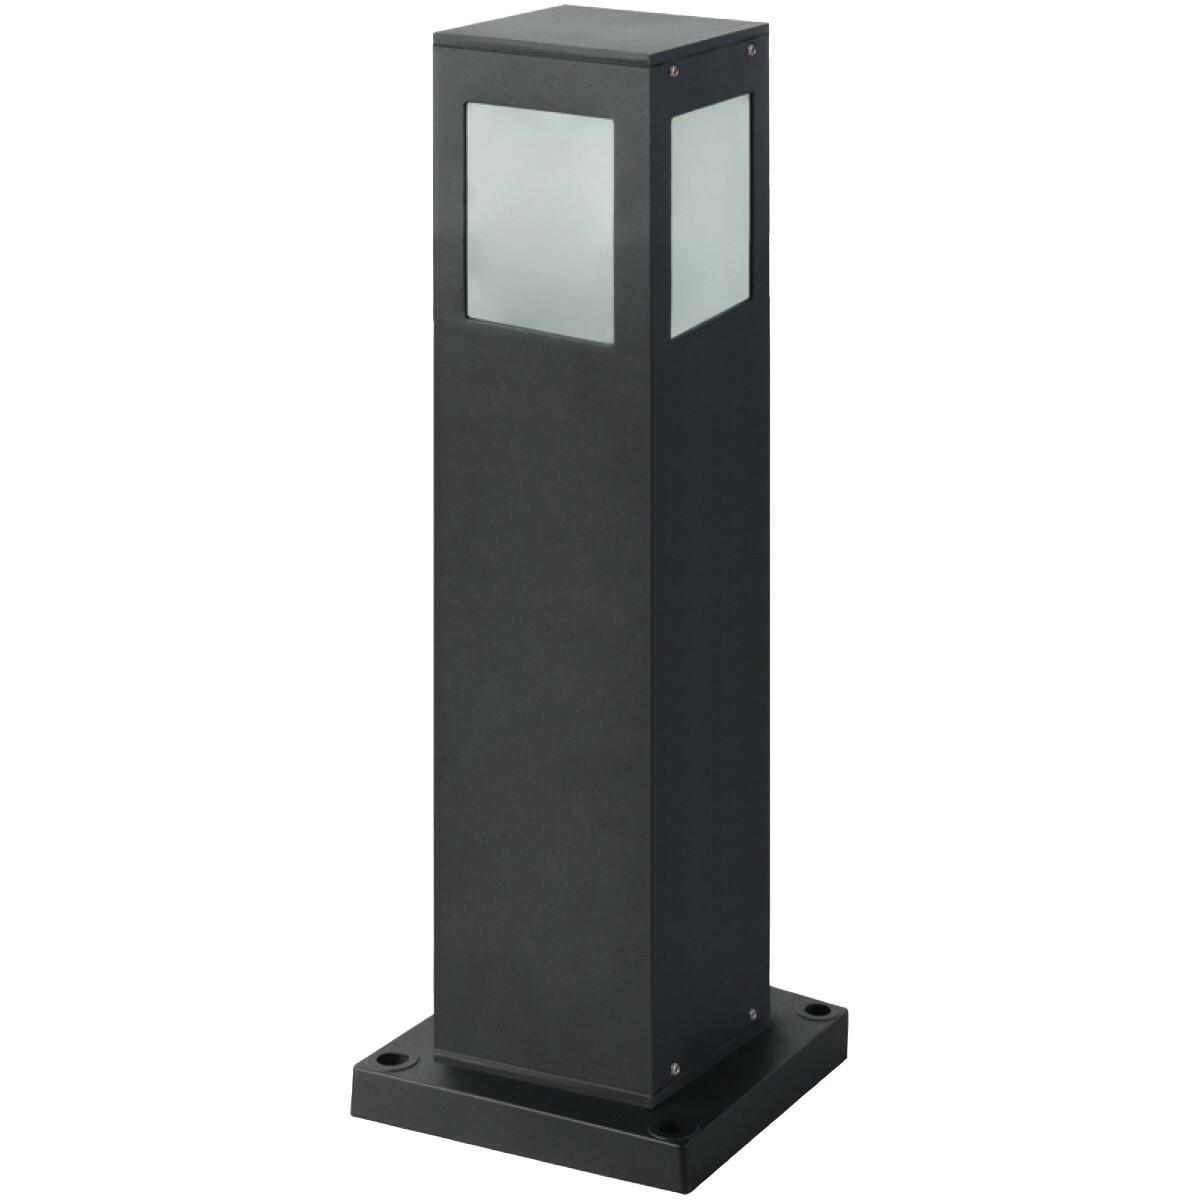 PHILIPS - LED Tuinverlichting - Staande Buitenlamp - CorePro LEDbulb 827 A60 - Kavy 4 - E27 Fitting